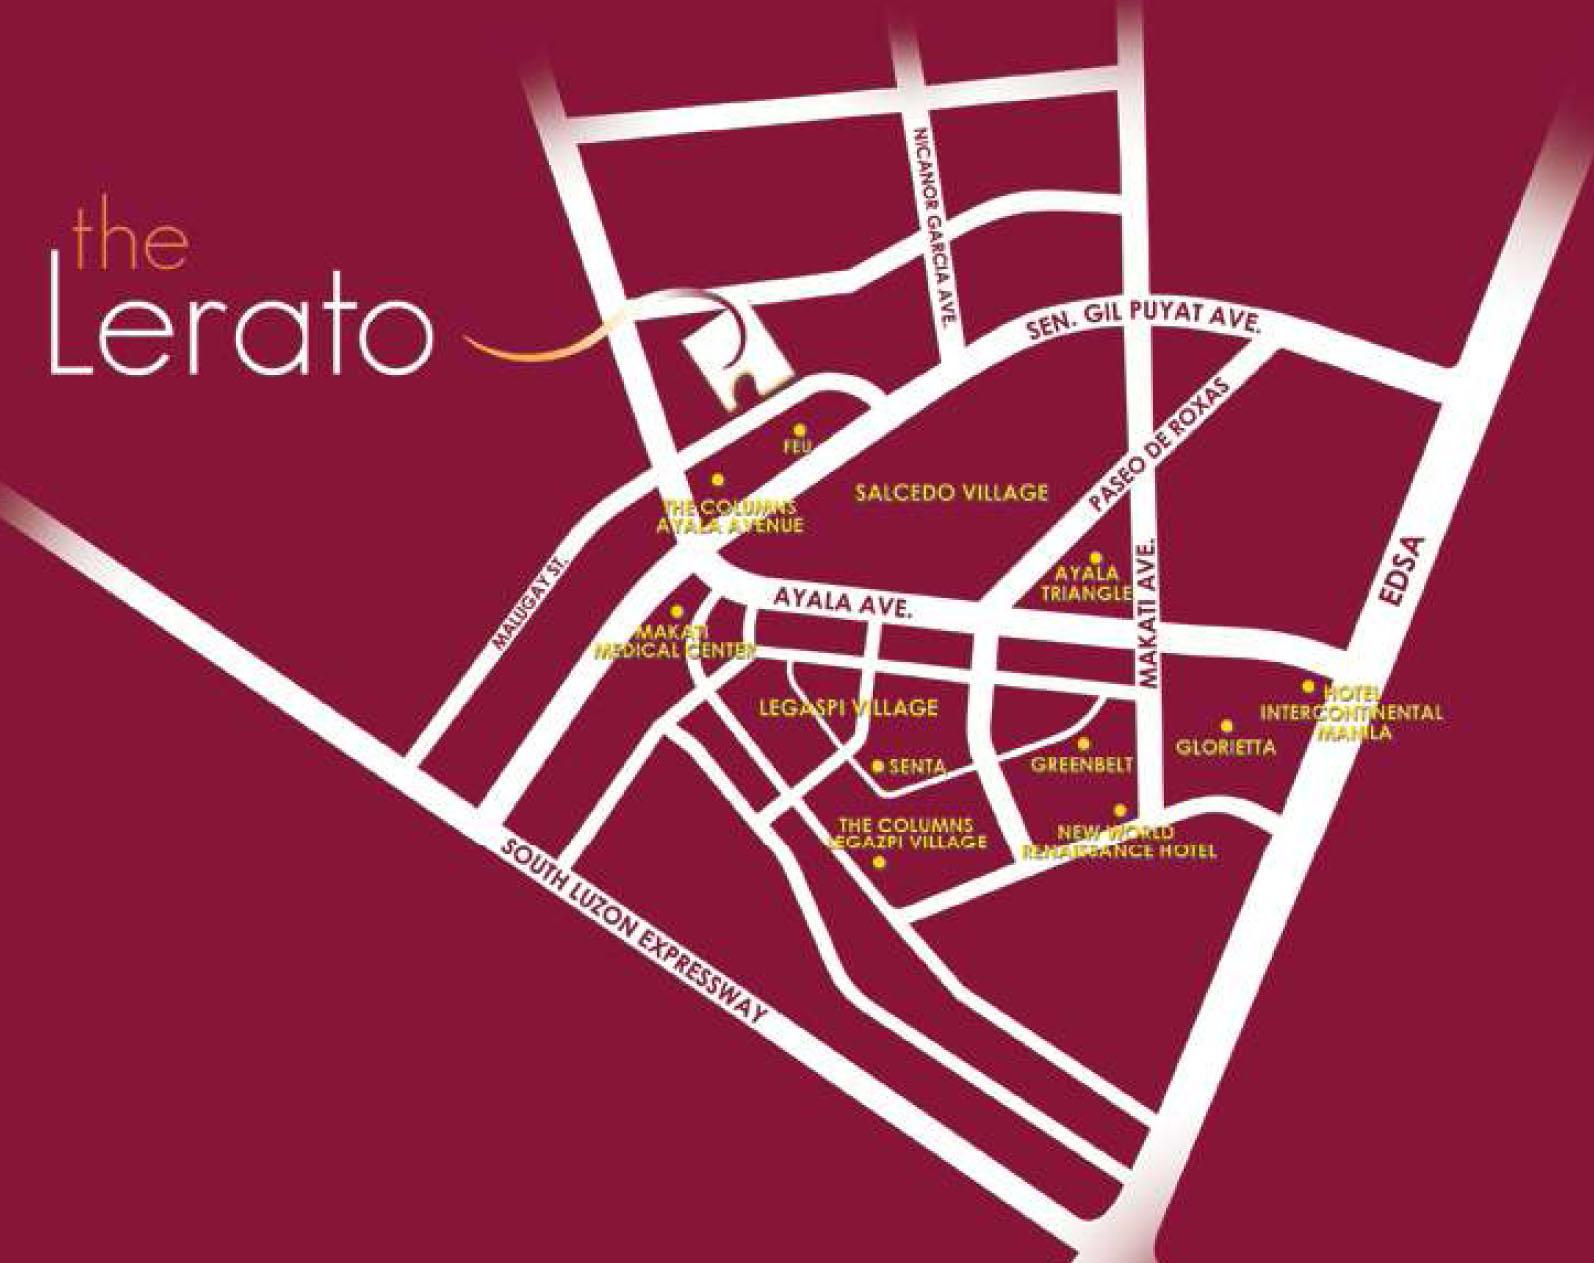 lerato-map.jpg